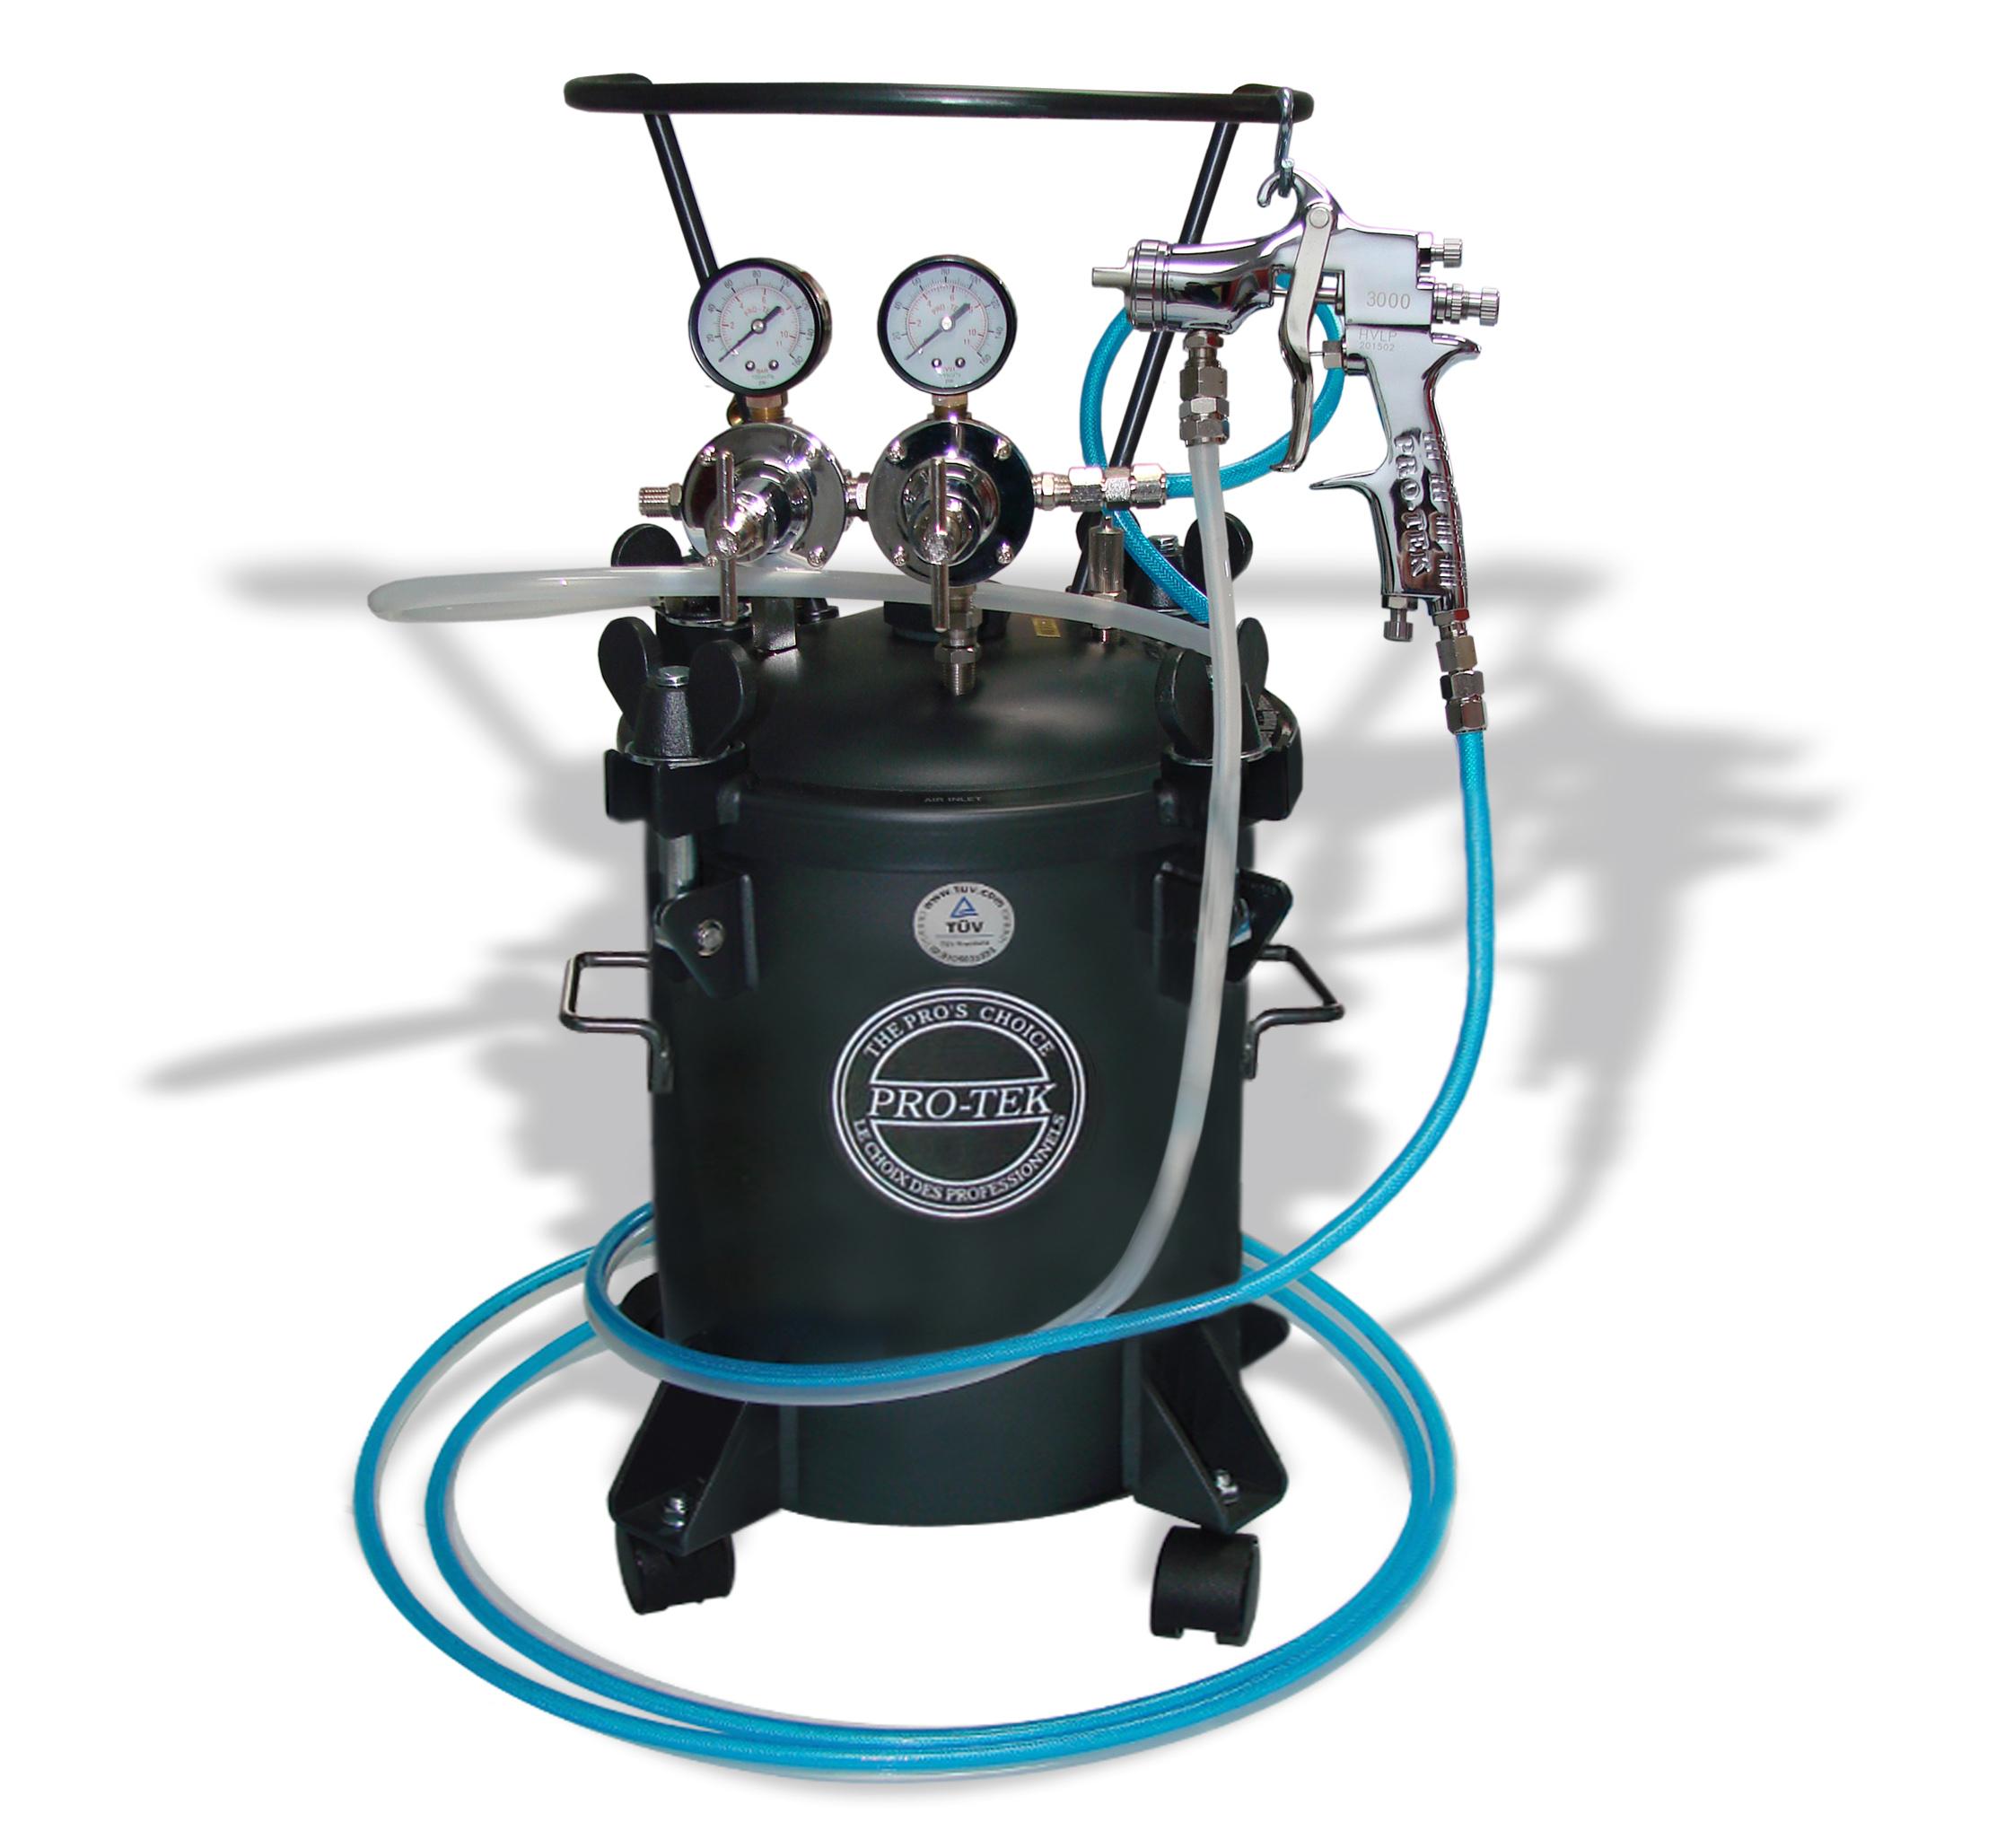 Pressure System Pro Teksprayequipment Com